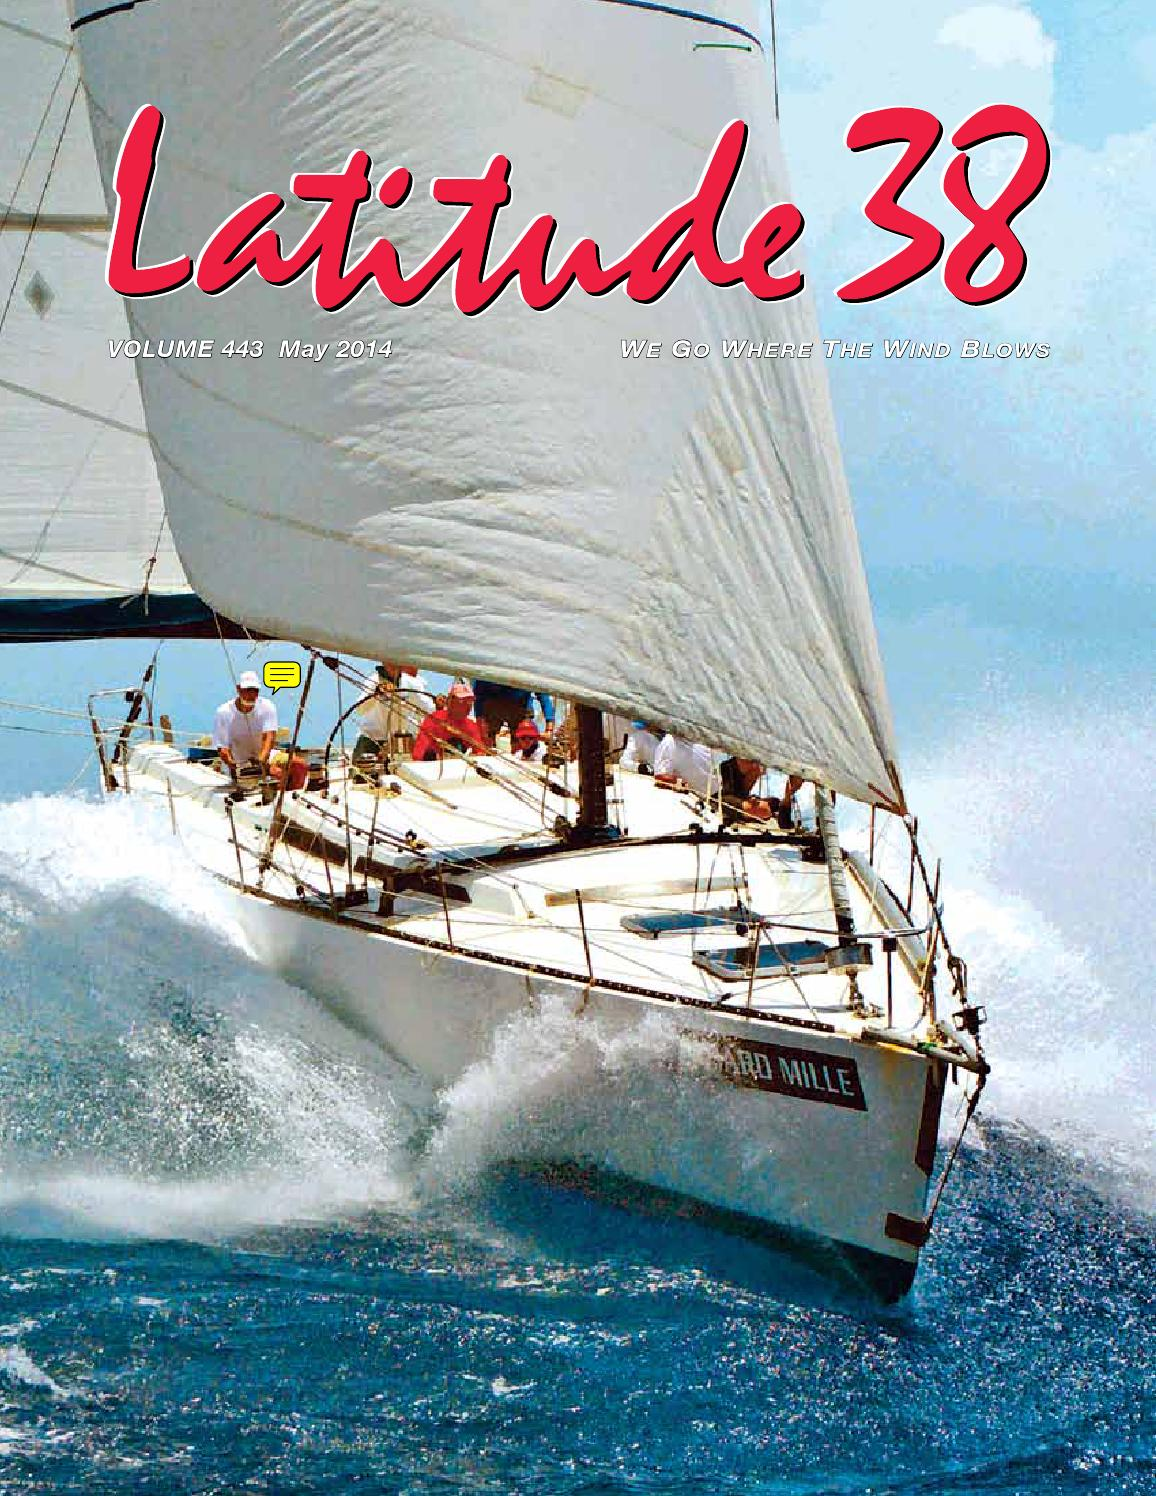 latitude 38 may 2014 by latitude 38 media llc issuu